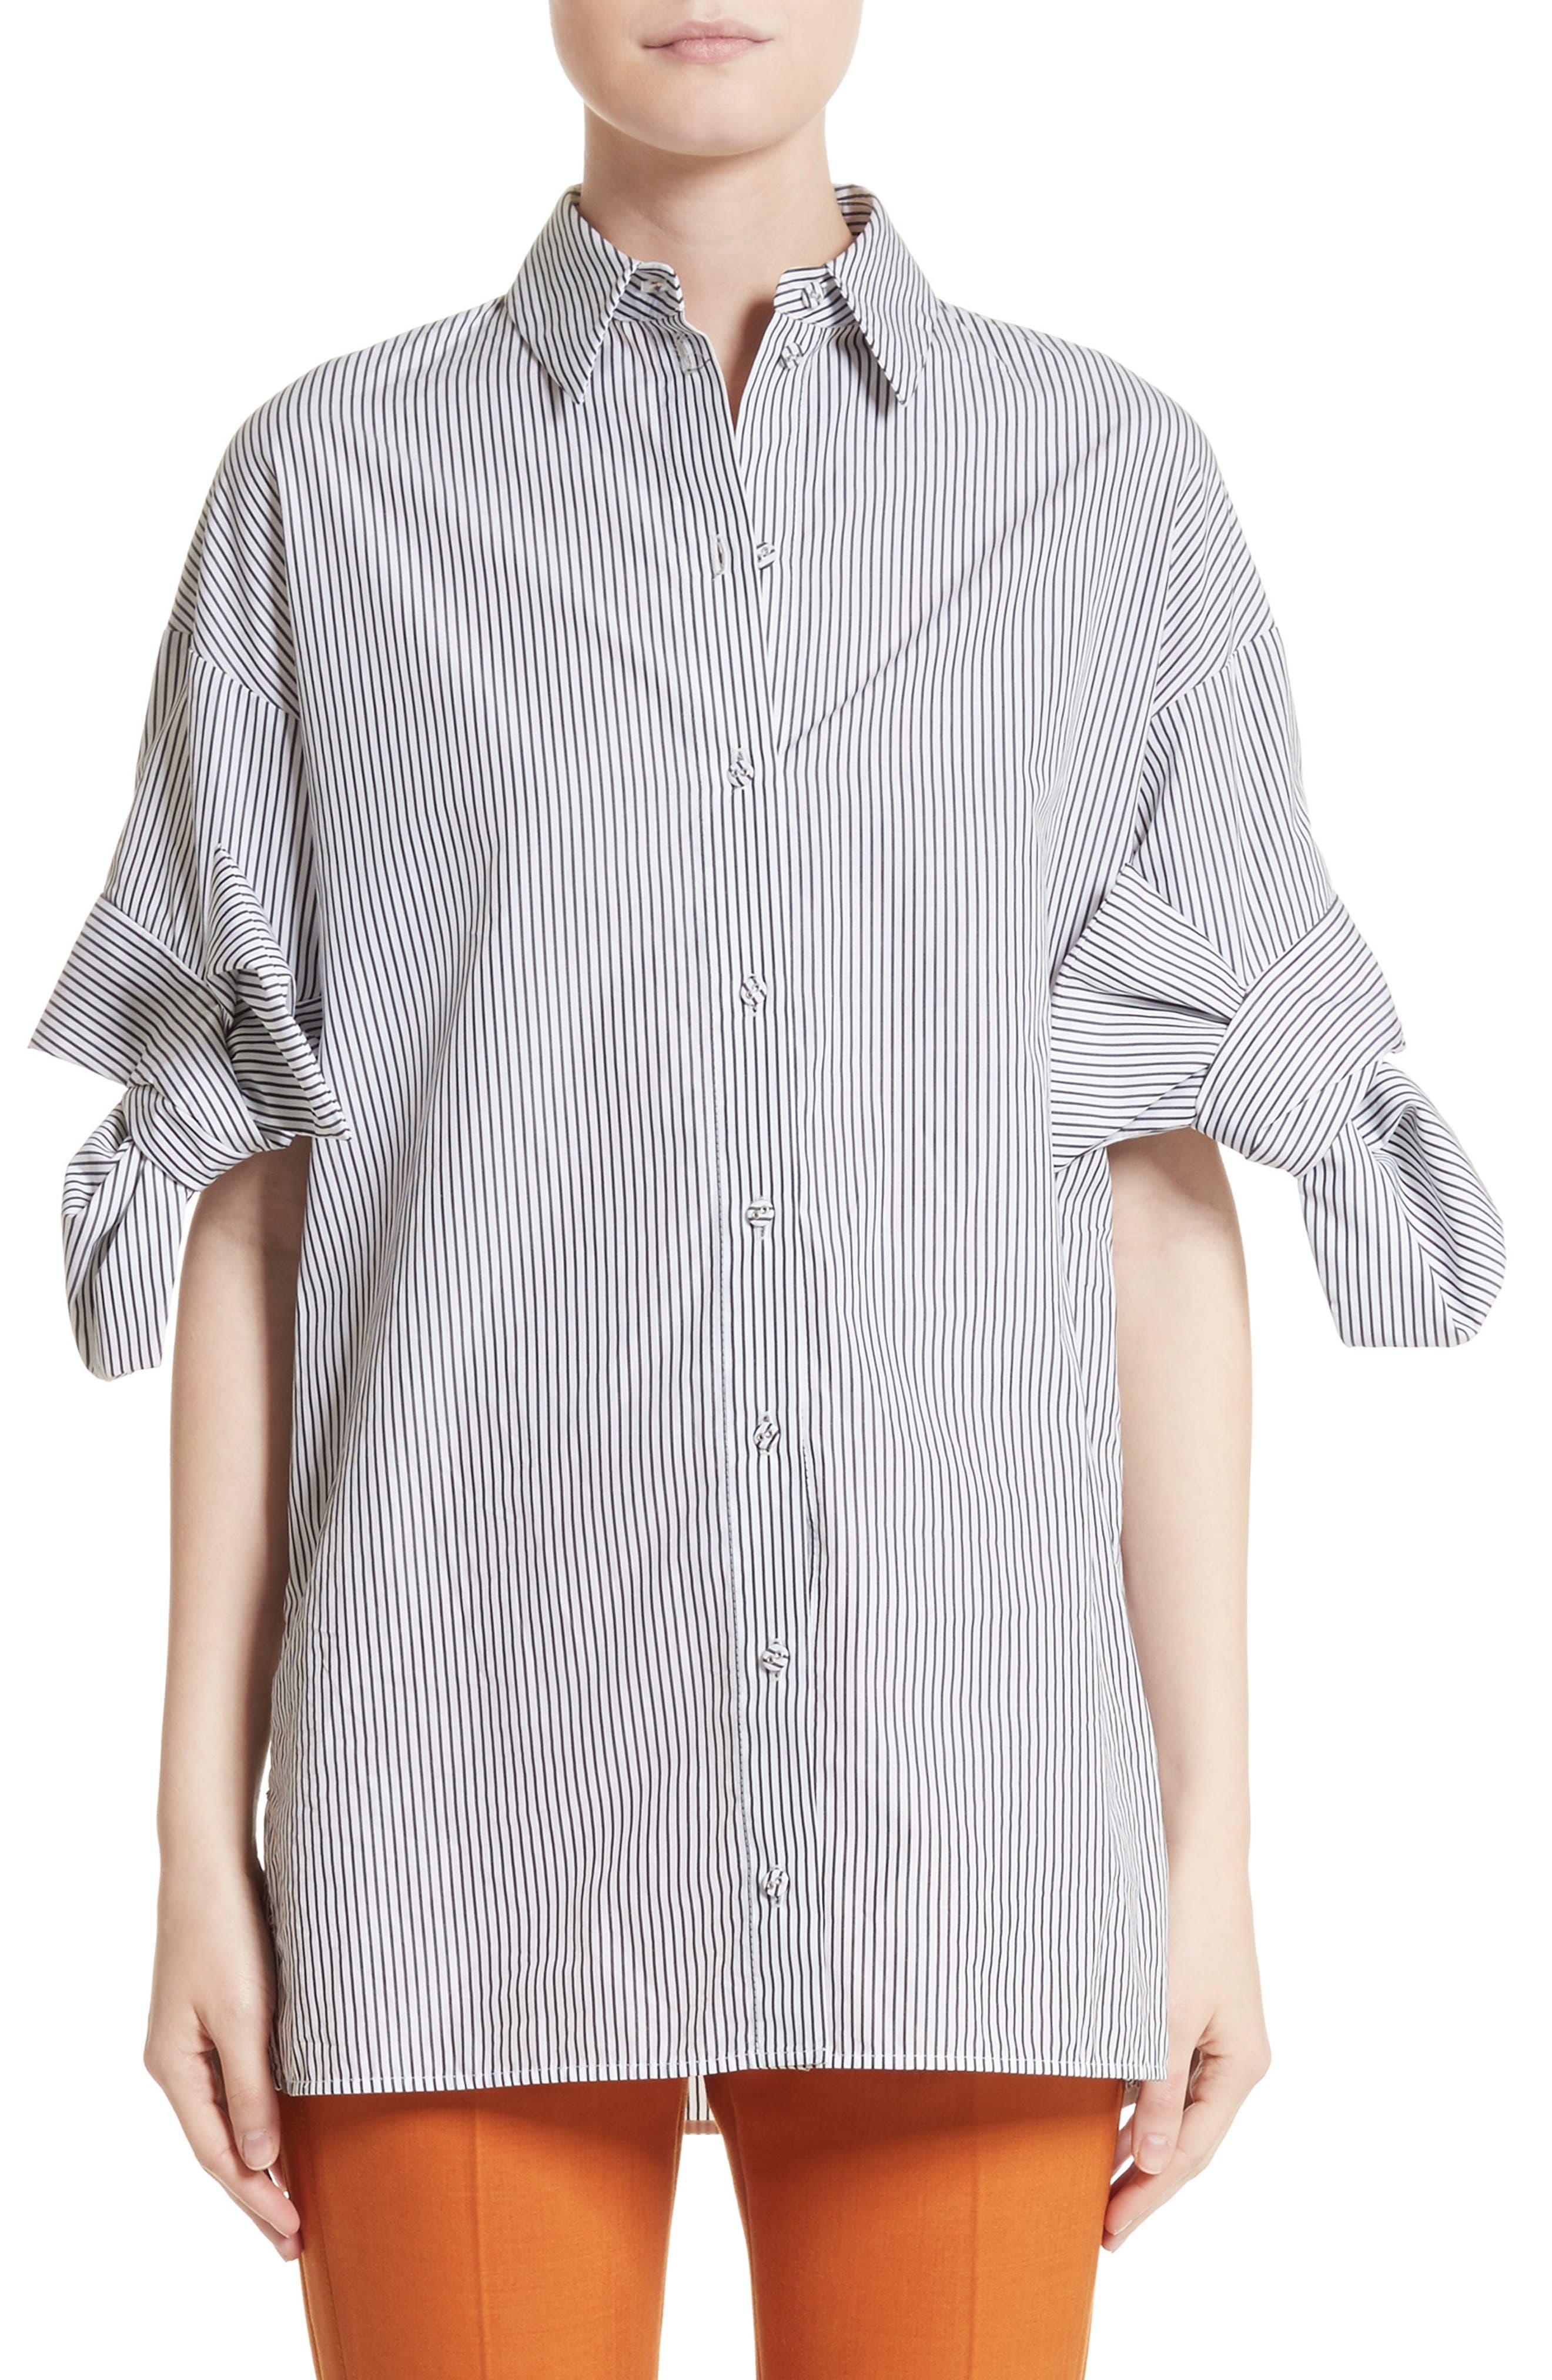 Bow Sleeve Shirt,                         Main,                         color, Black/ White